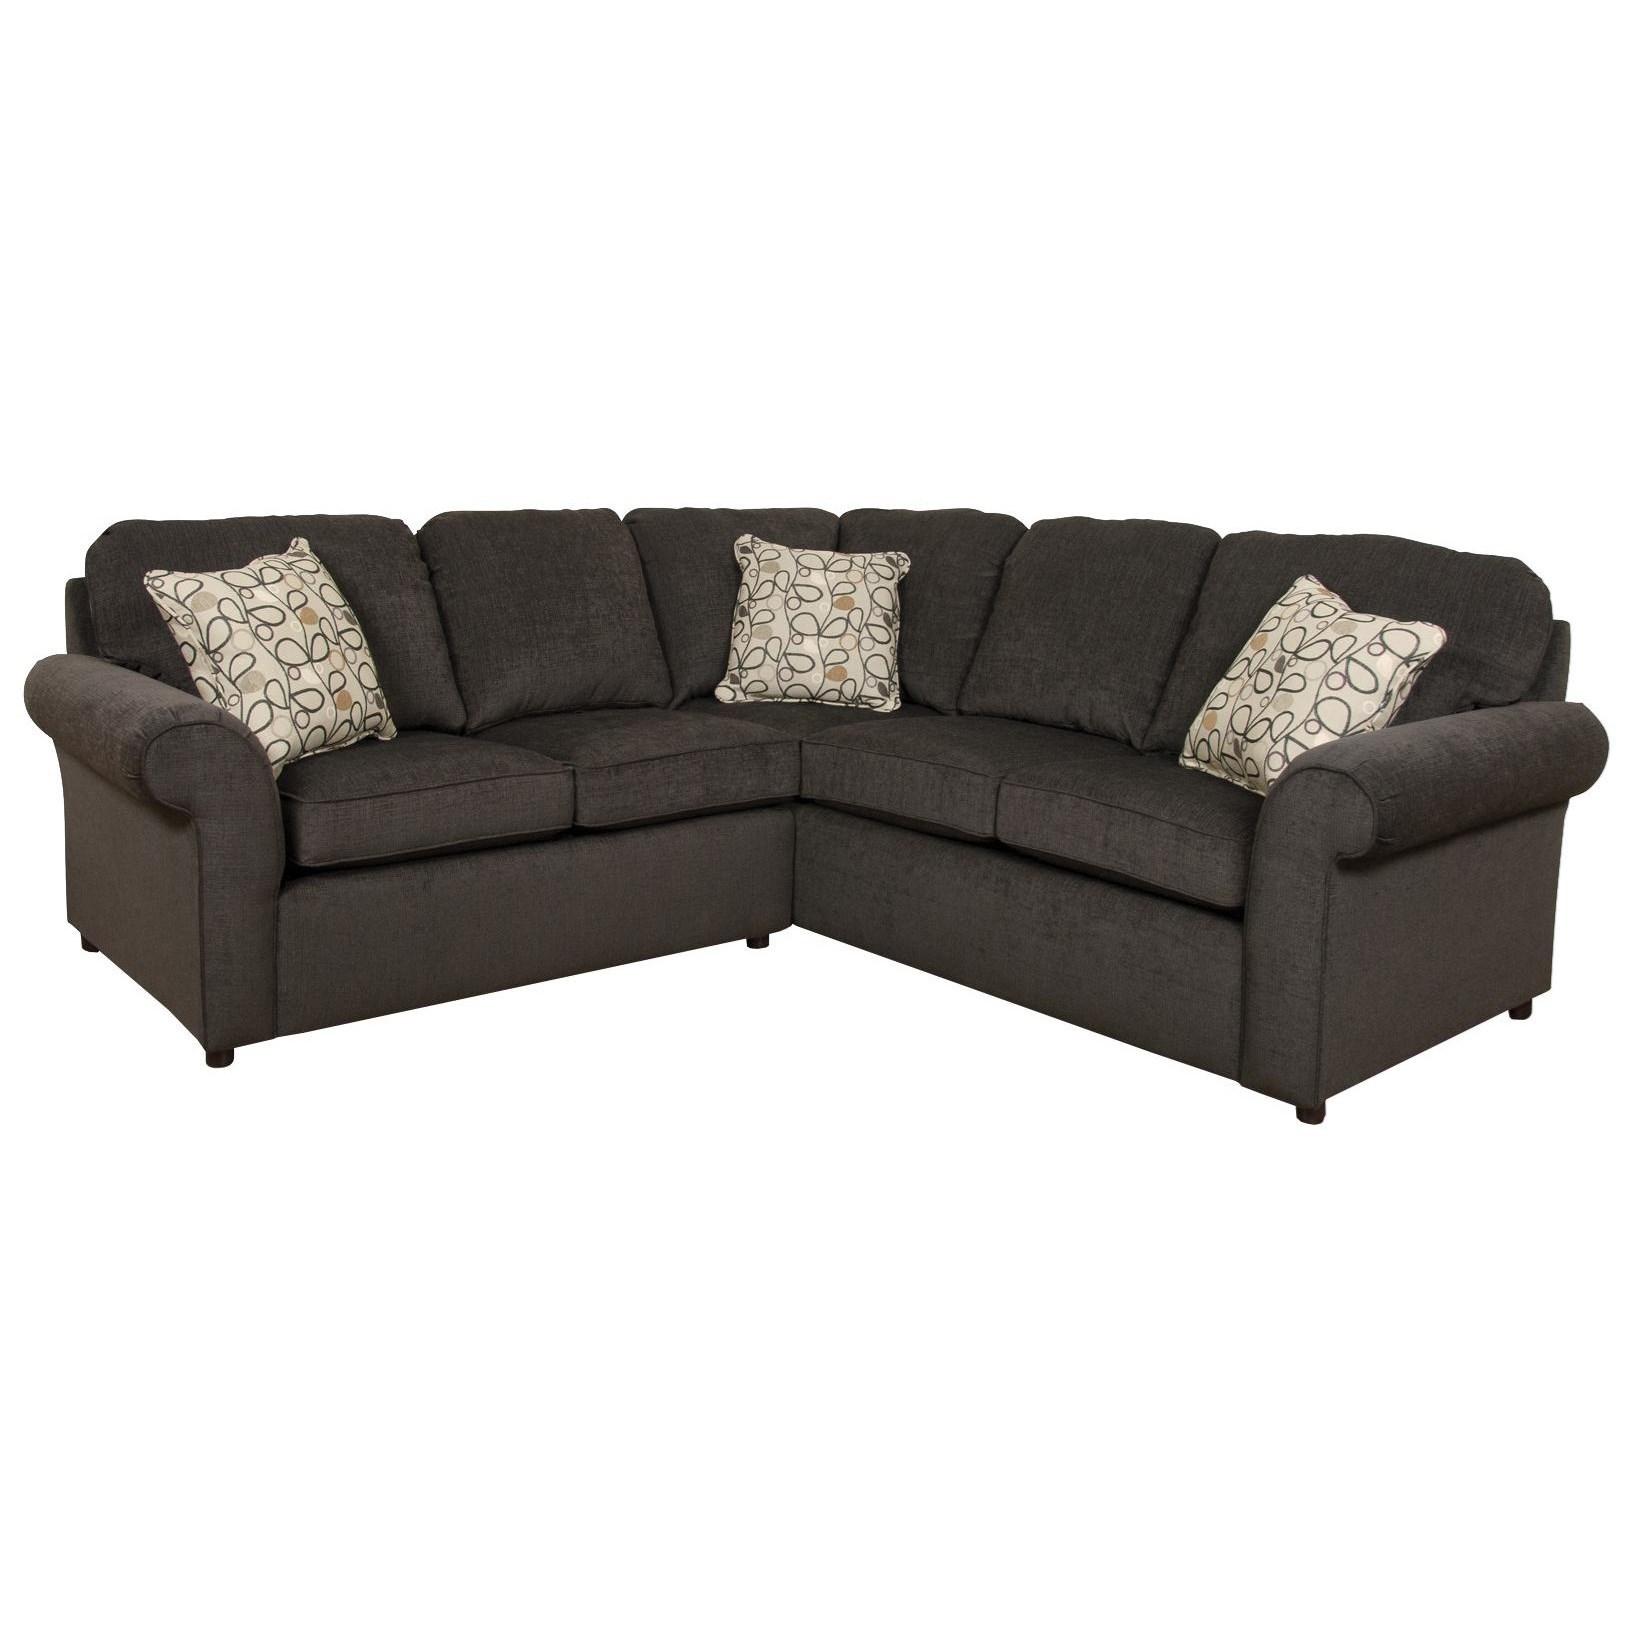 England Malibu4 5 Seat Corner Sectional Sofa ...